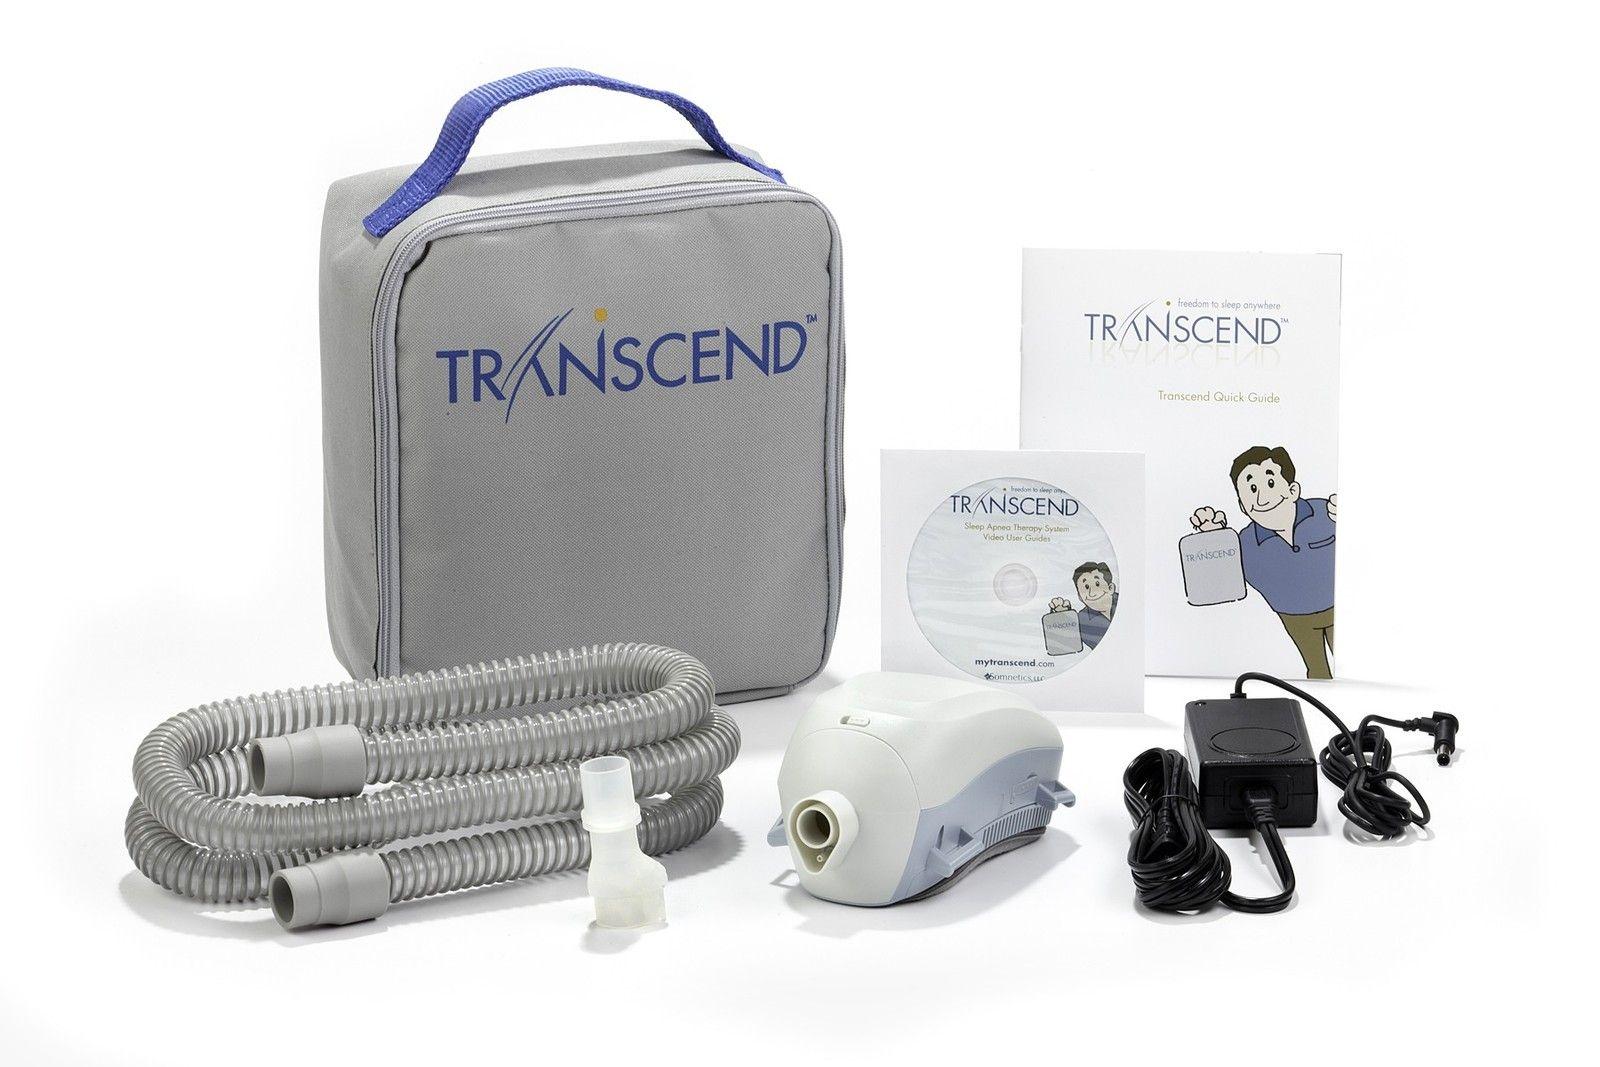 Transcend CPAP Starter Kit Cpap Machines Sleep apnea